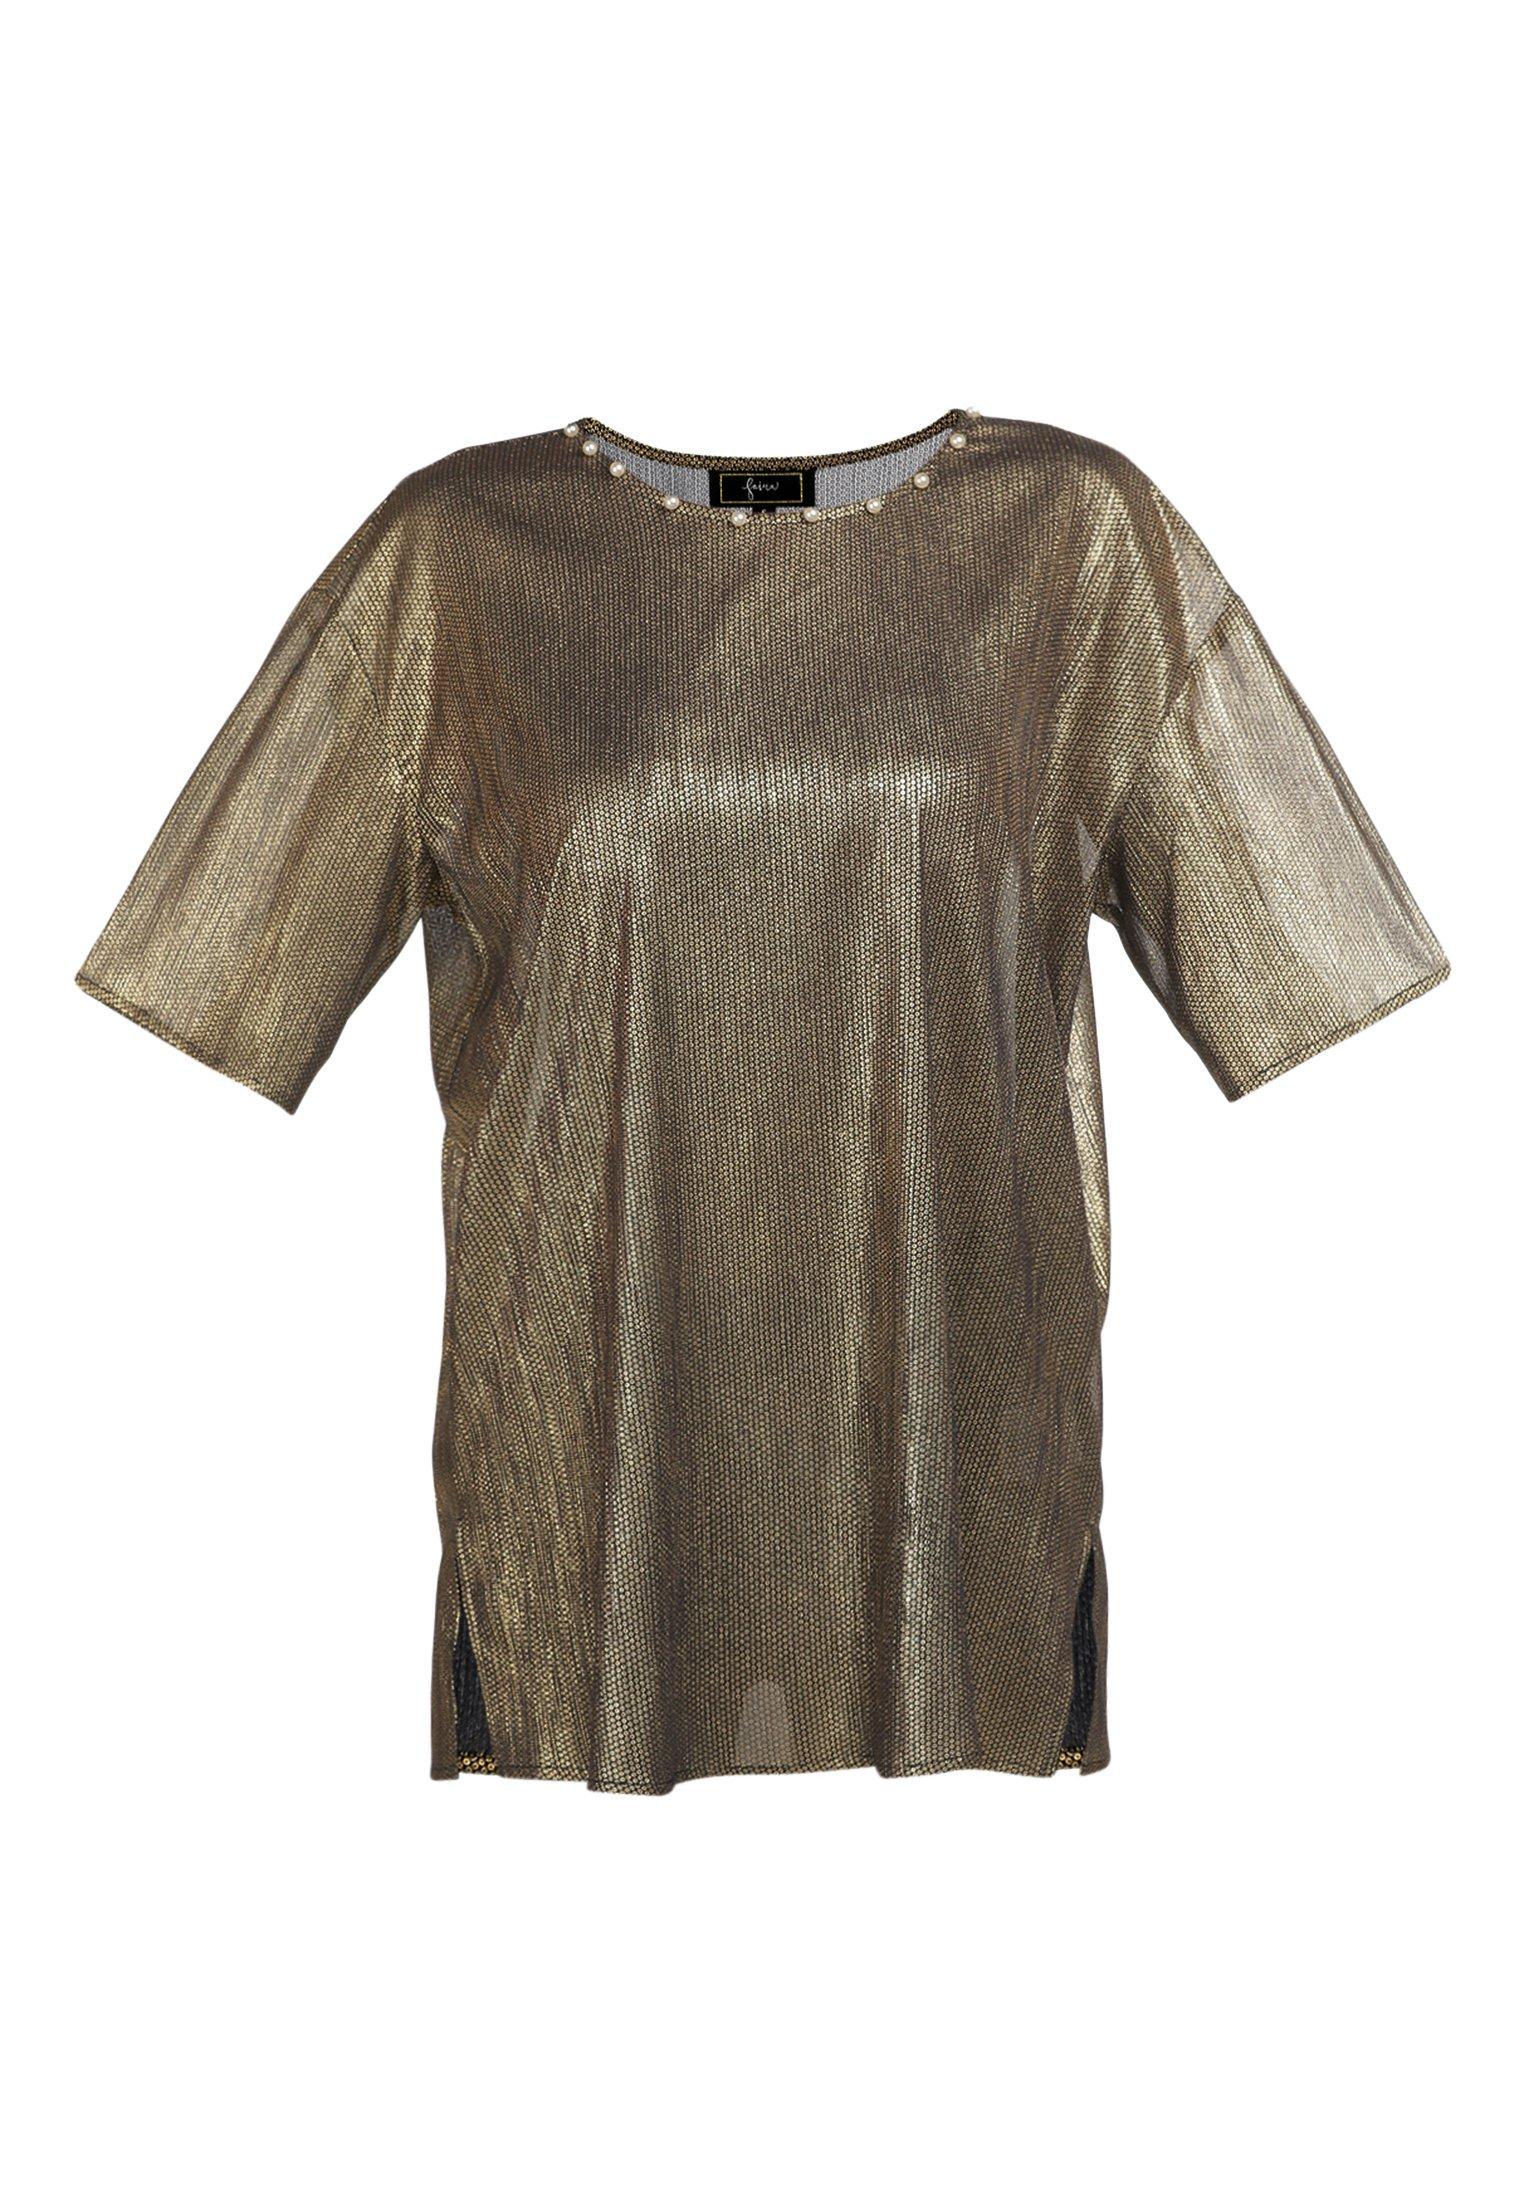 Safe Payment Women's Clothing faina Tunic schwarz gold HUK9jfUZZ